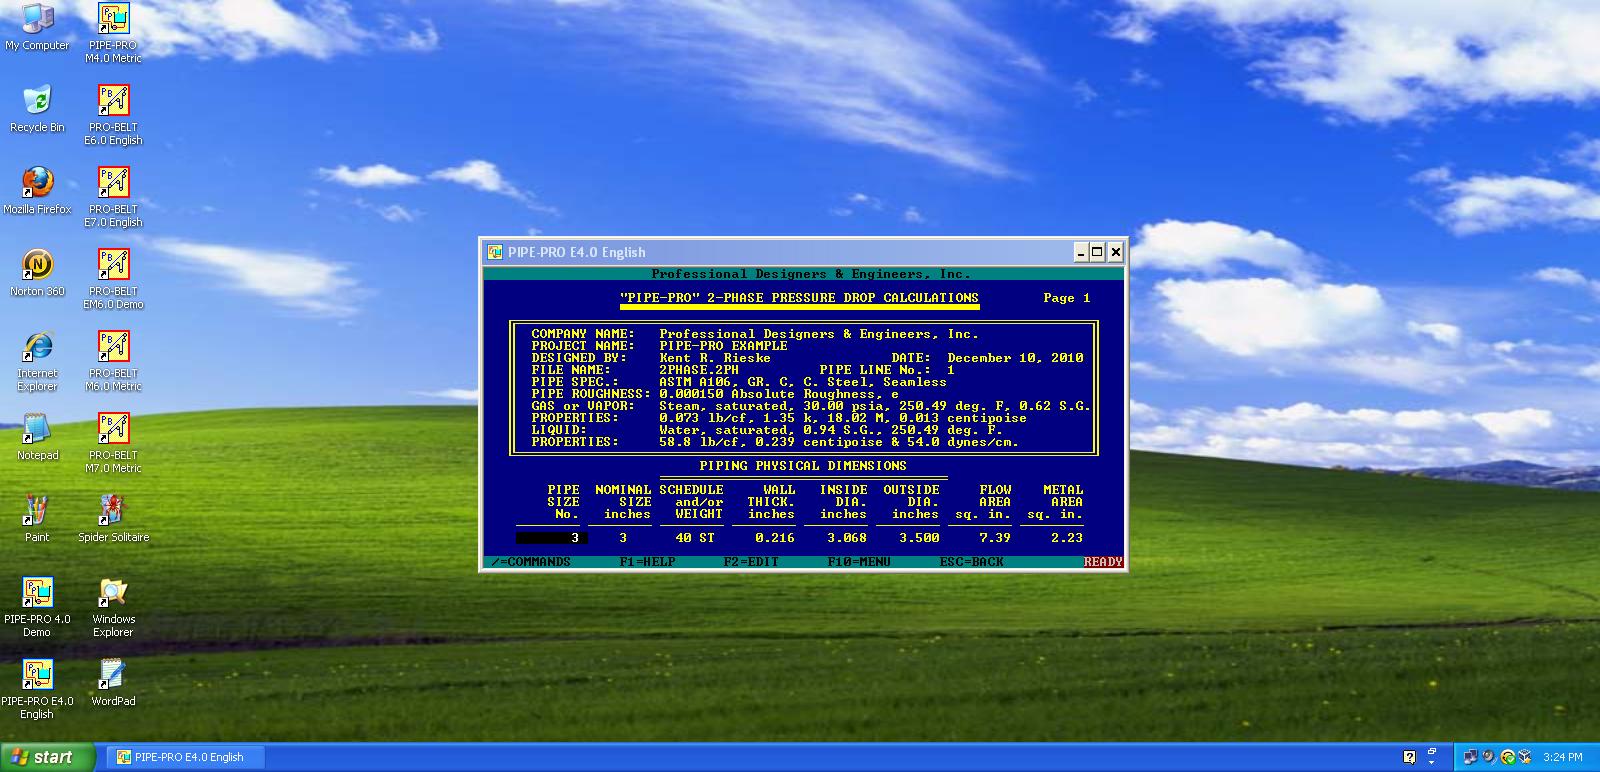 Windows xp professional sp3 activation key crack.